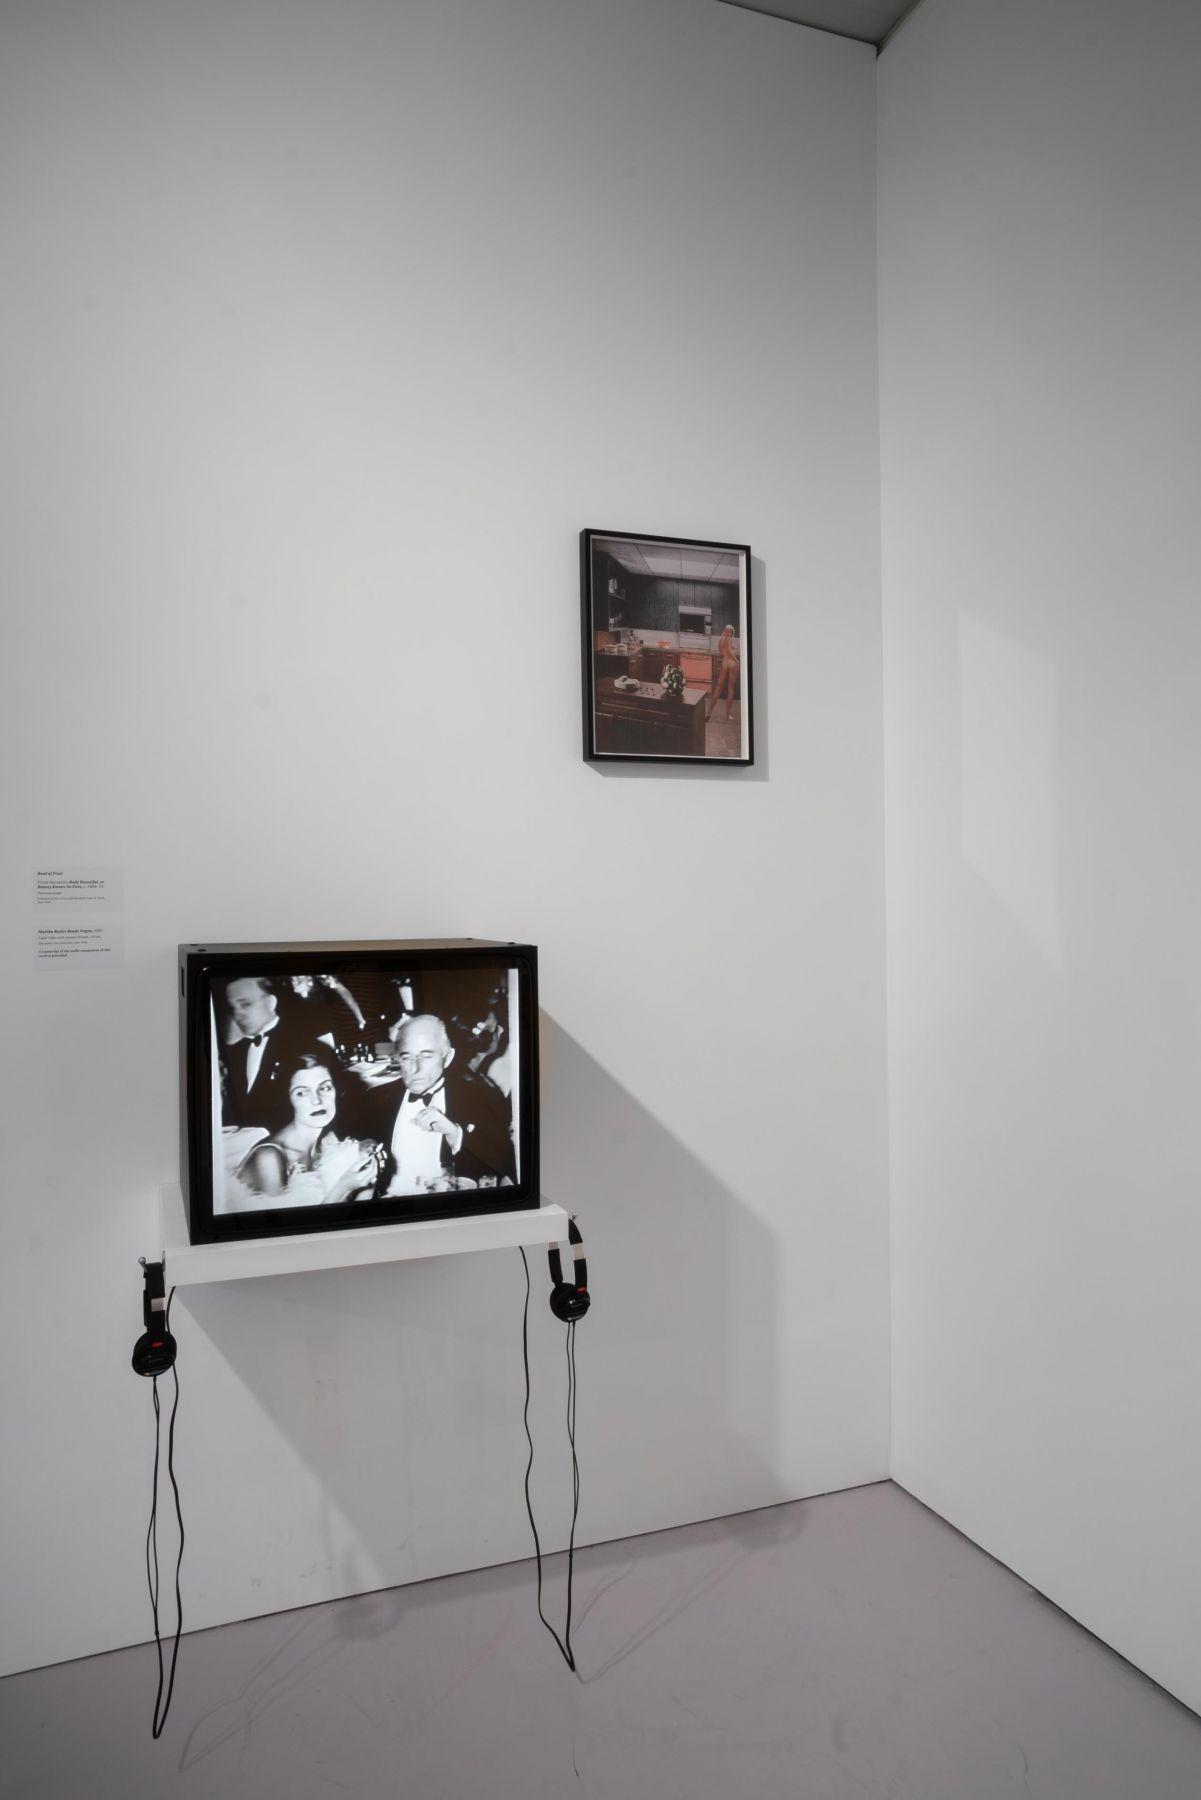 MARTHA ROSLER Installation view ofIrrespectiveat The Jewish Museum, New York, 2018